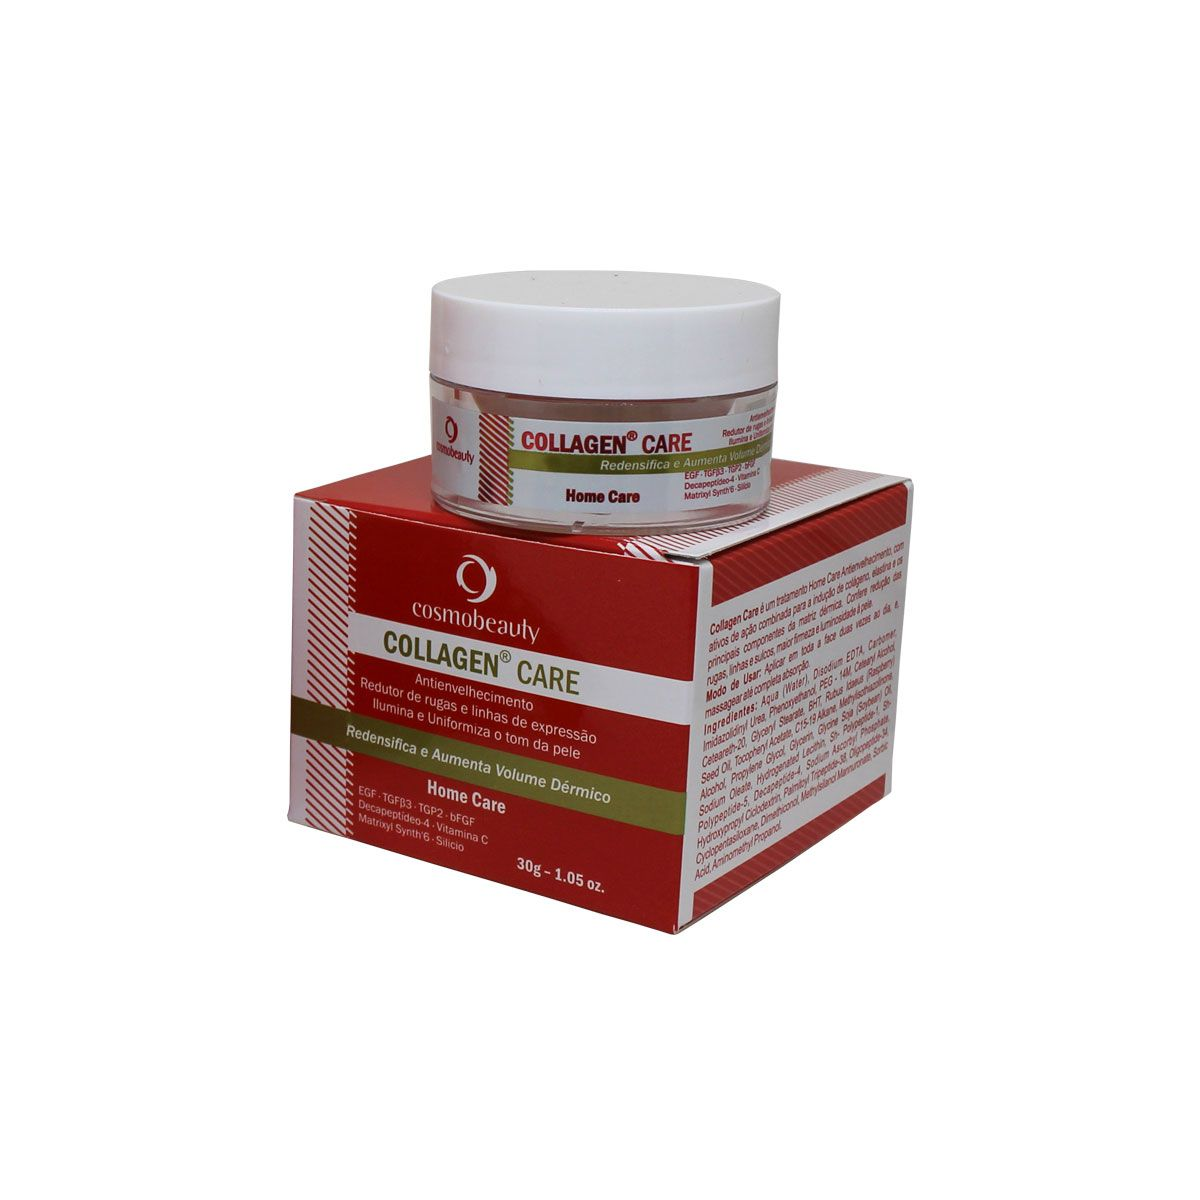 Redutor de Rugas Collagen Care - 30g